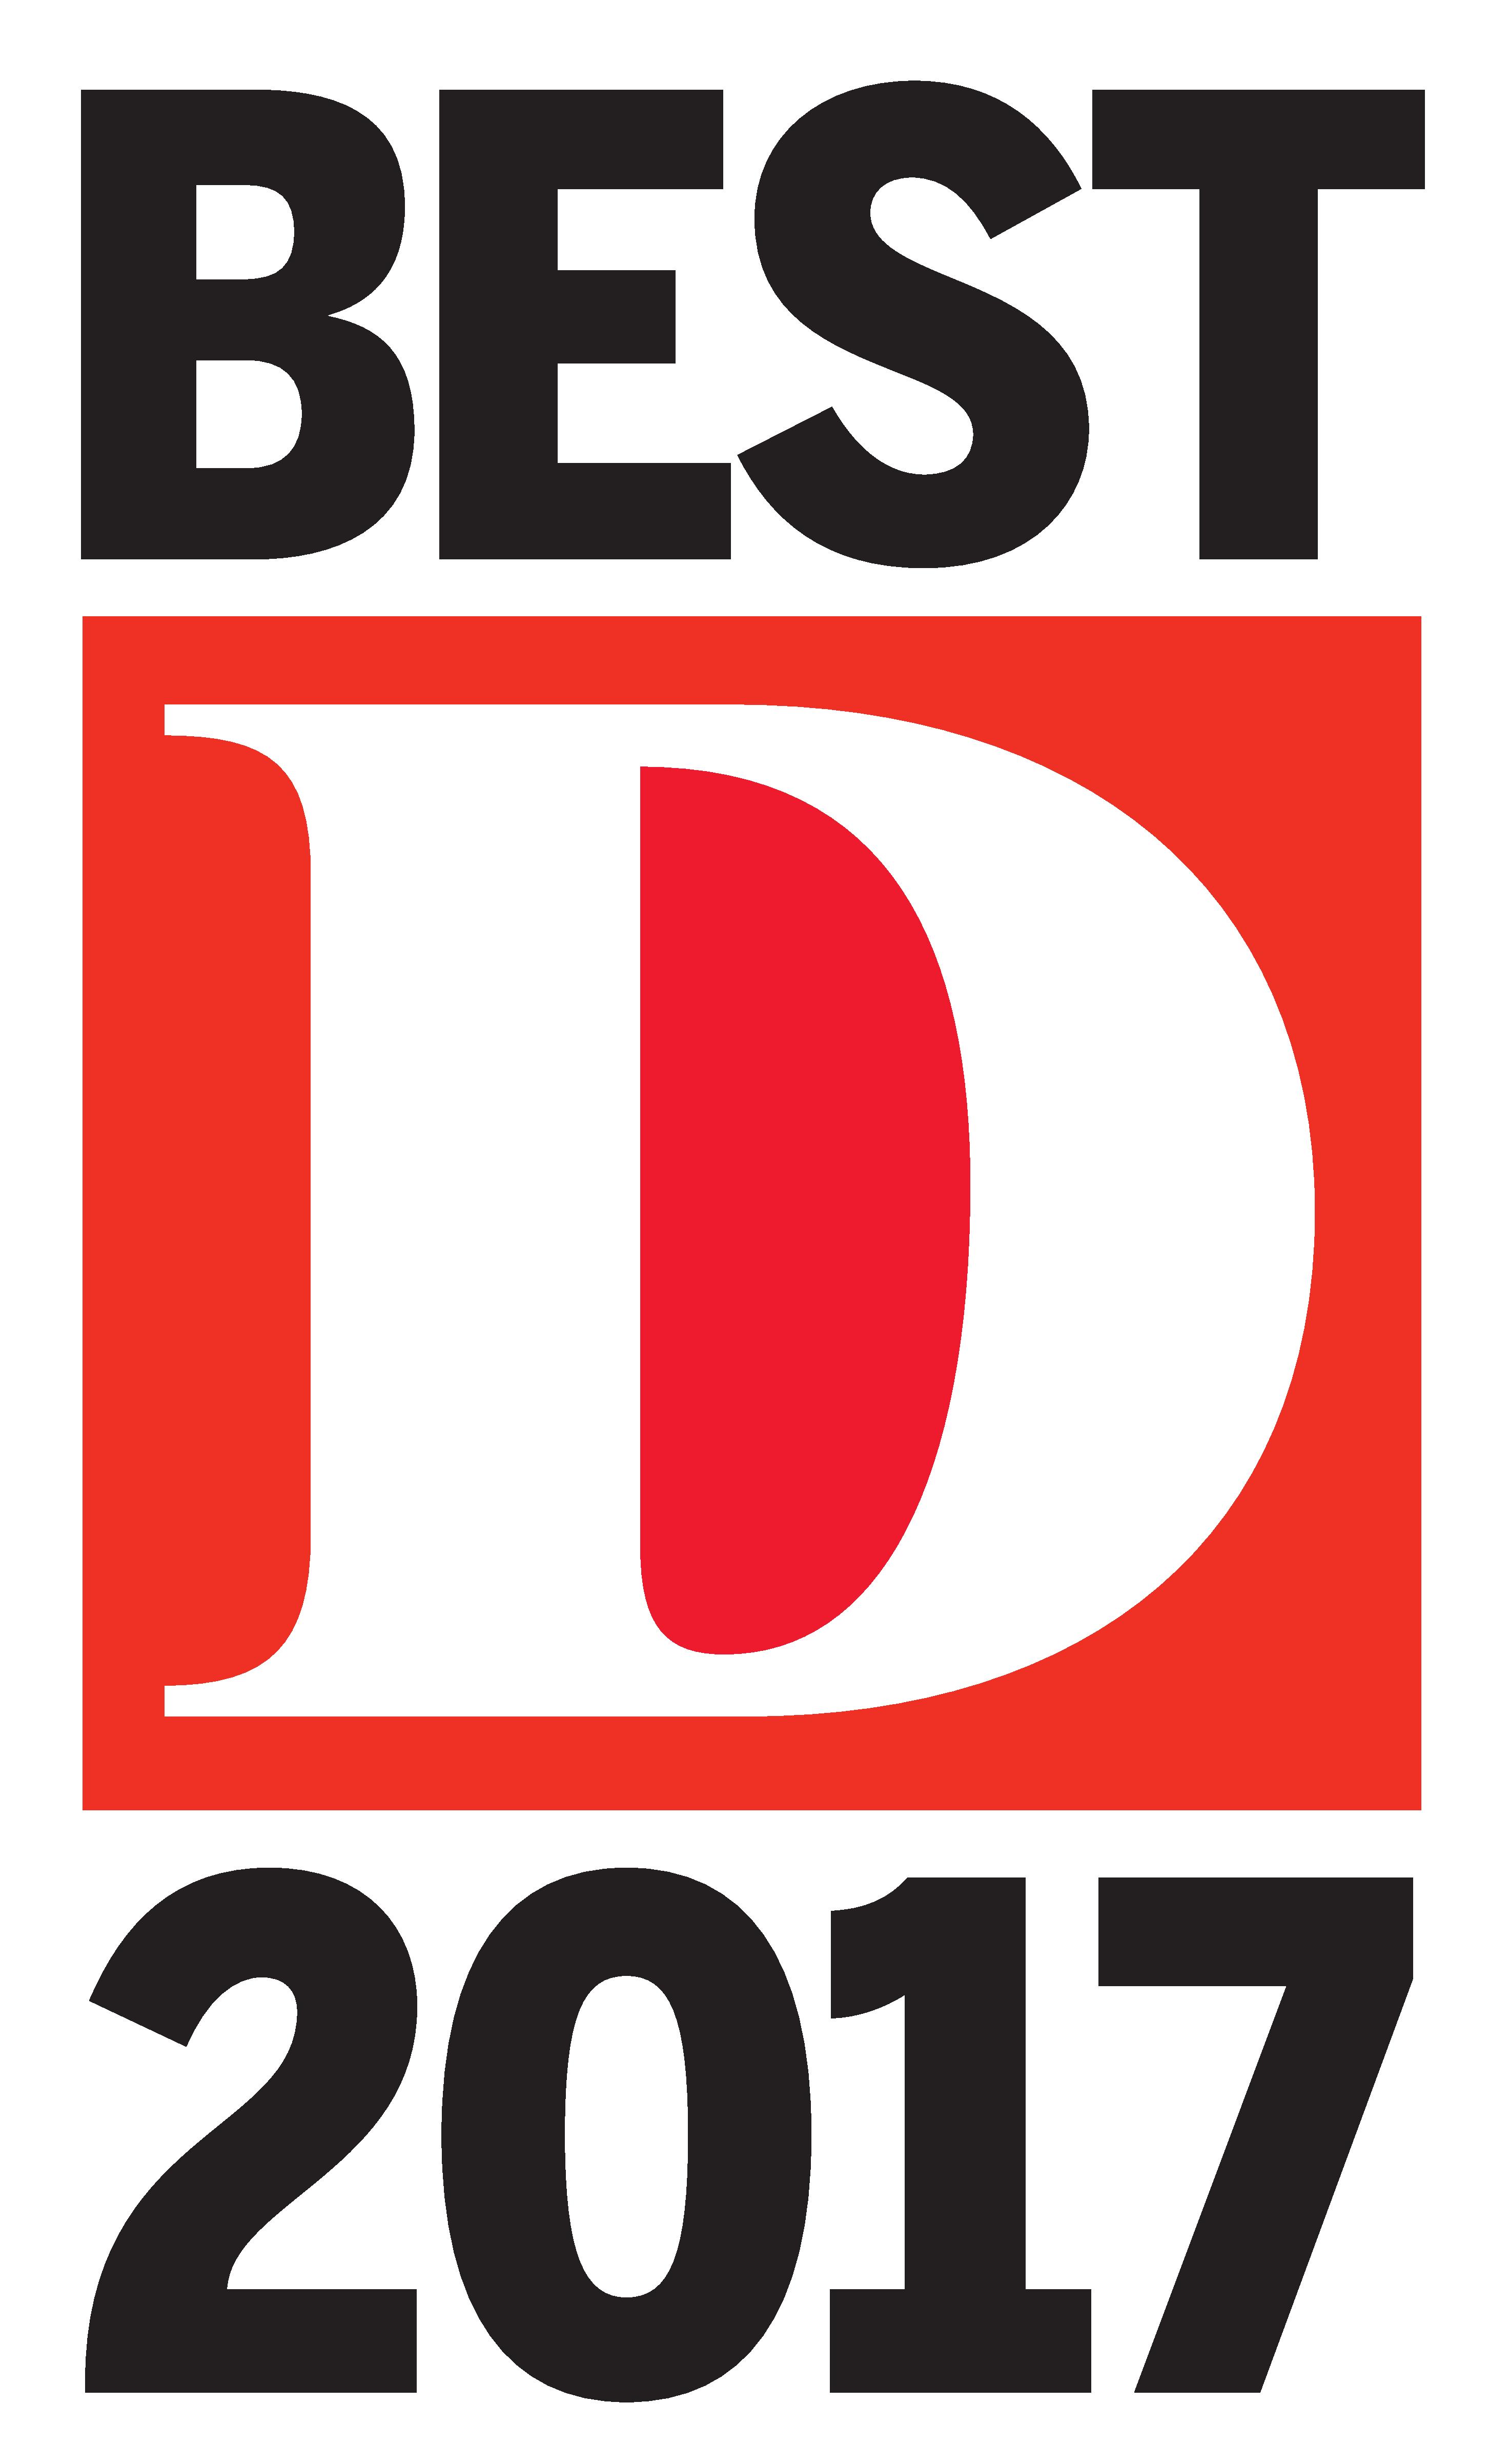 Best Dentist in Dallas 2017